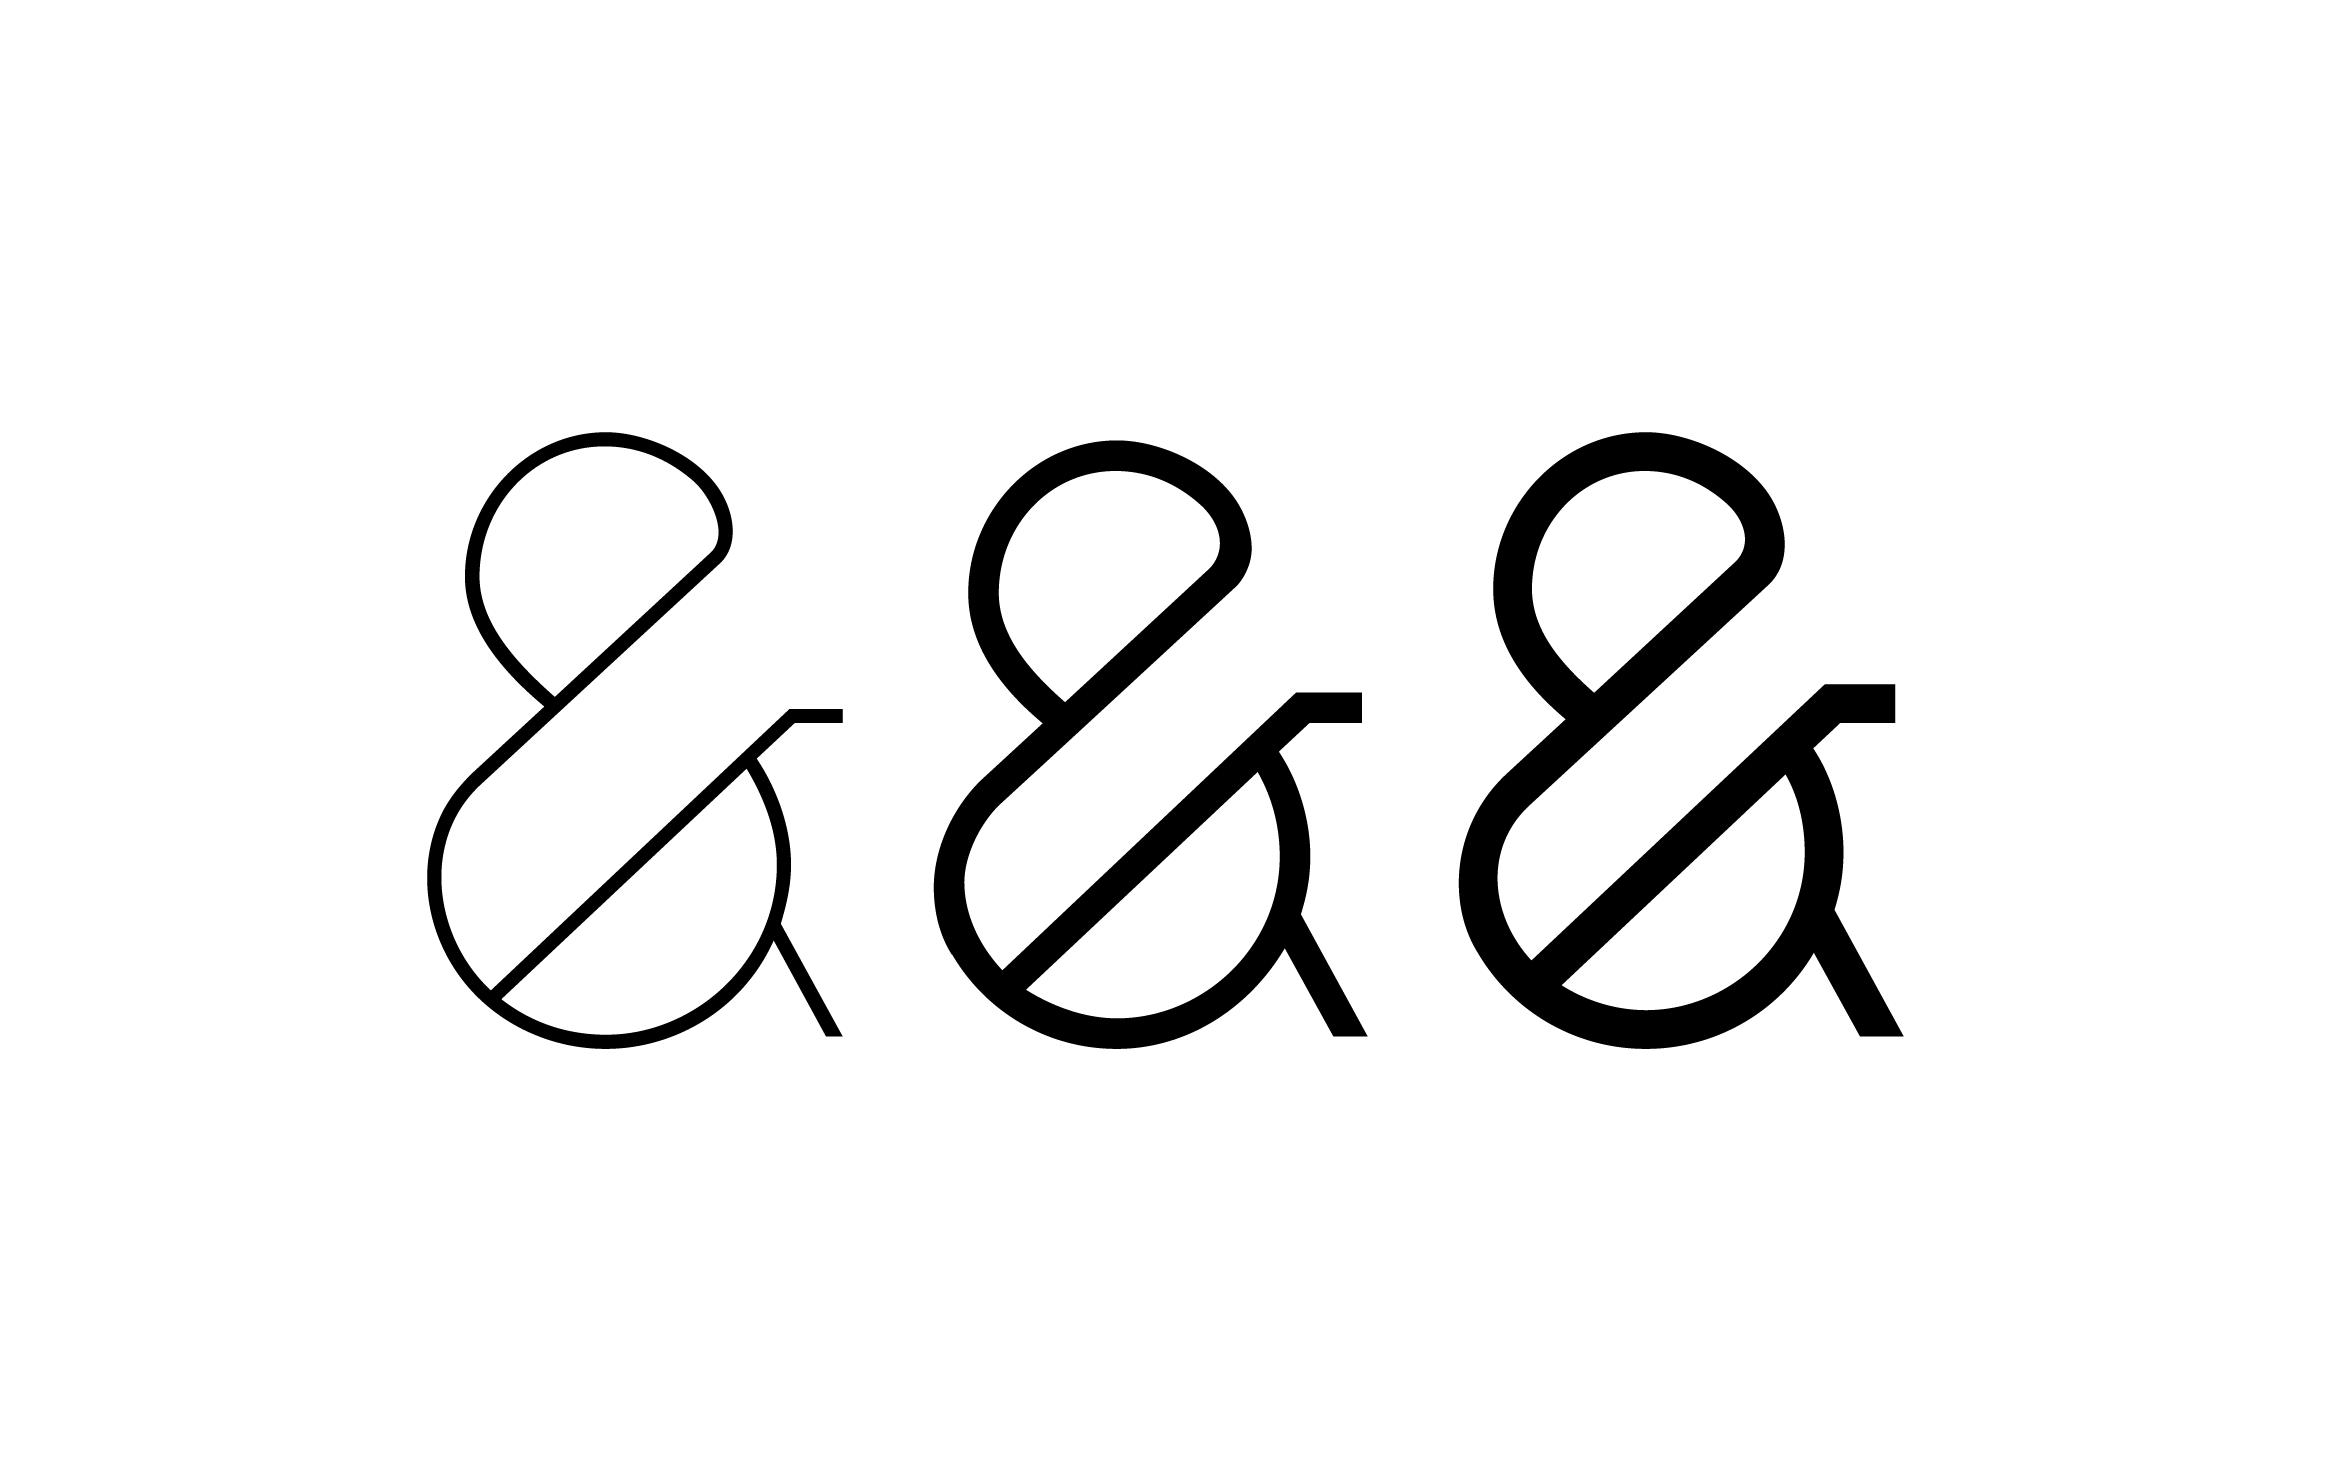 Paris Pro Typeface - Light Family by Moshik Nadav